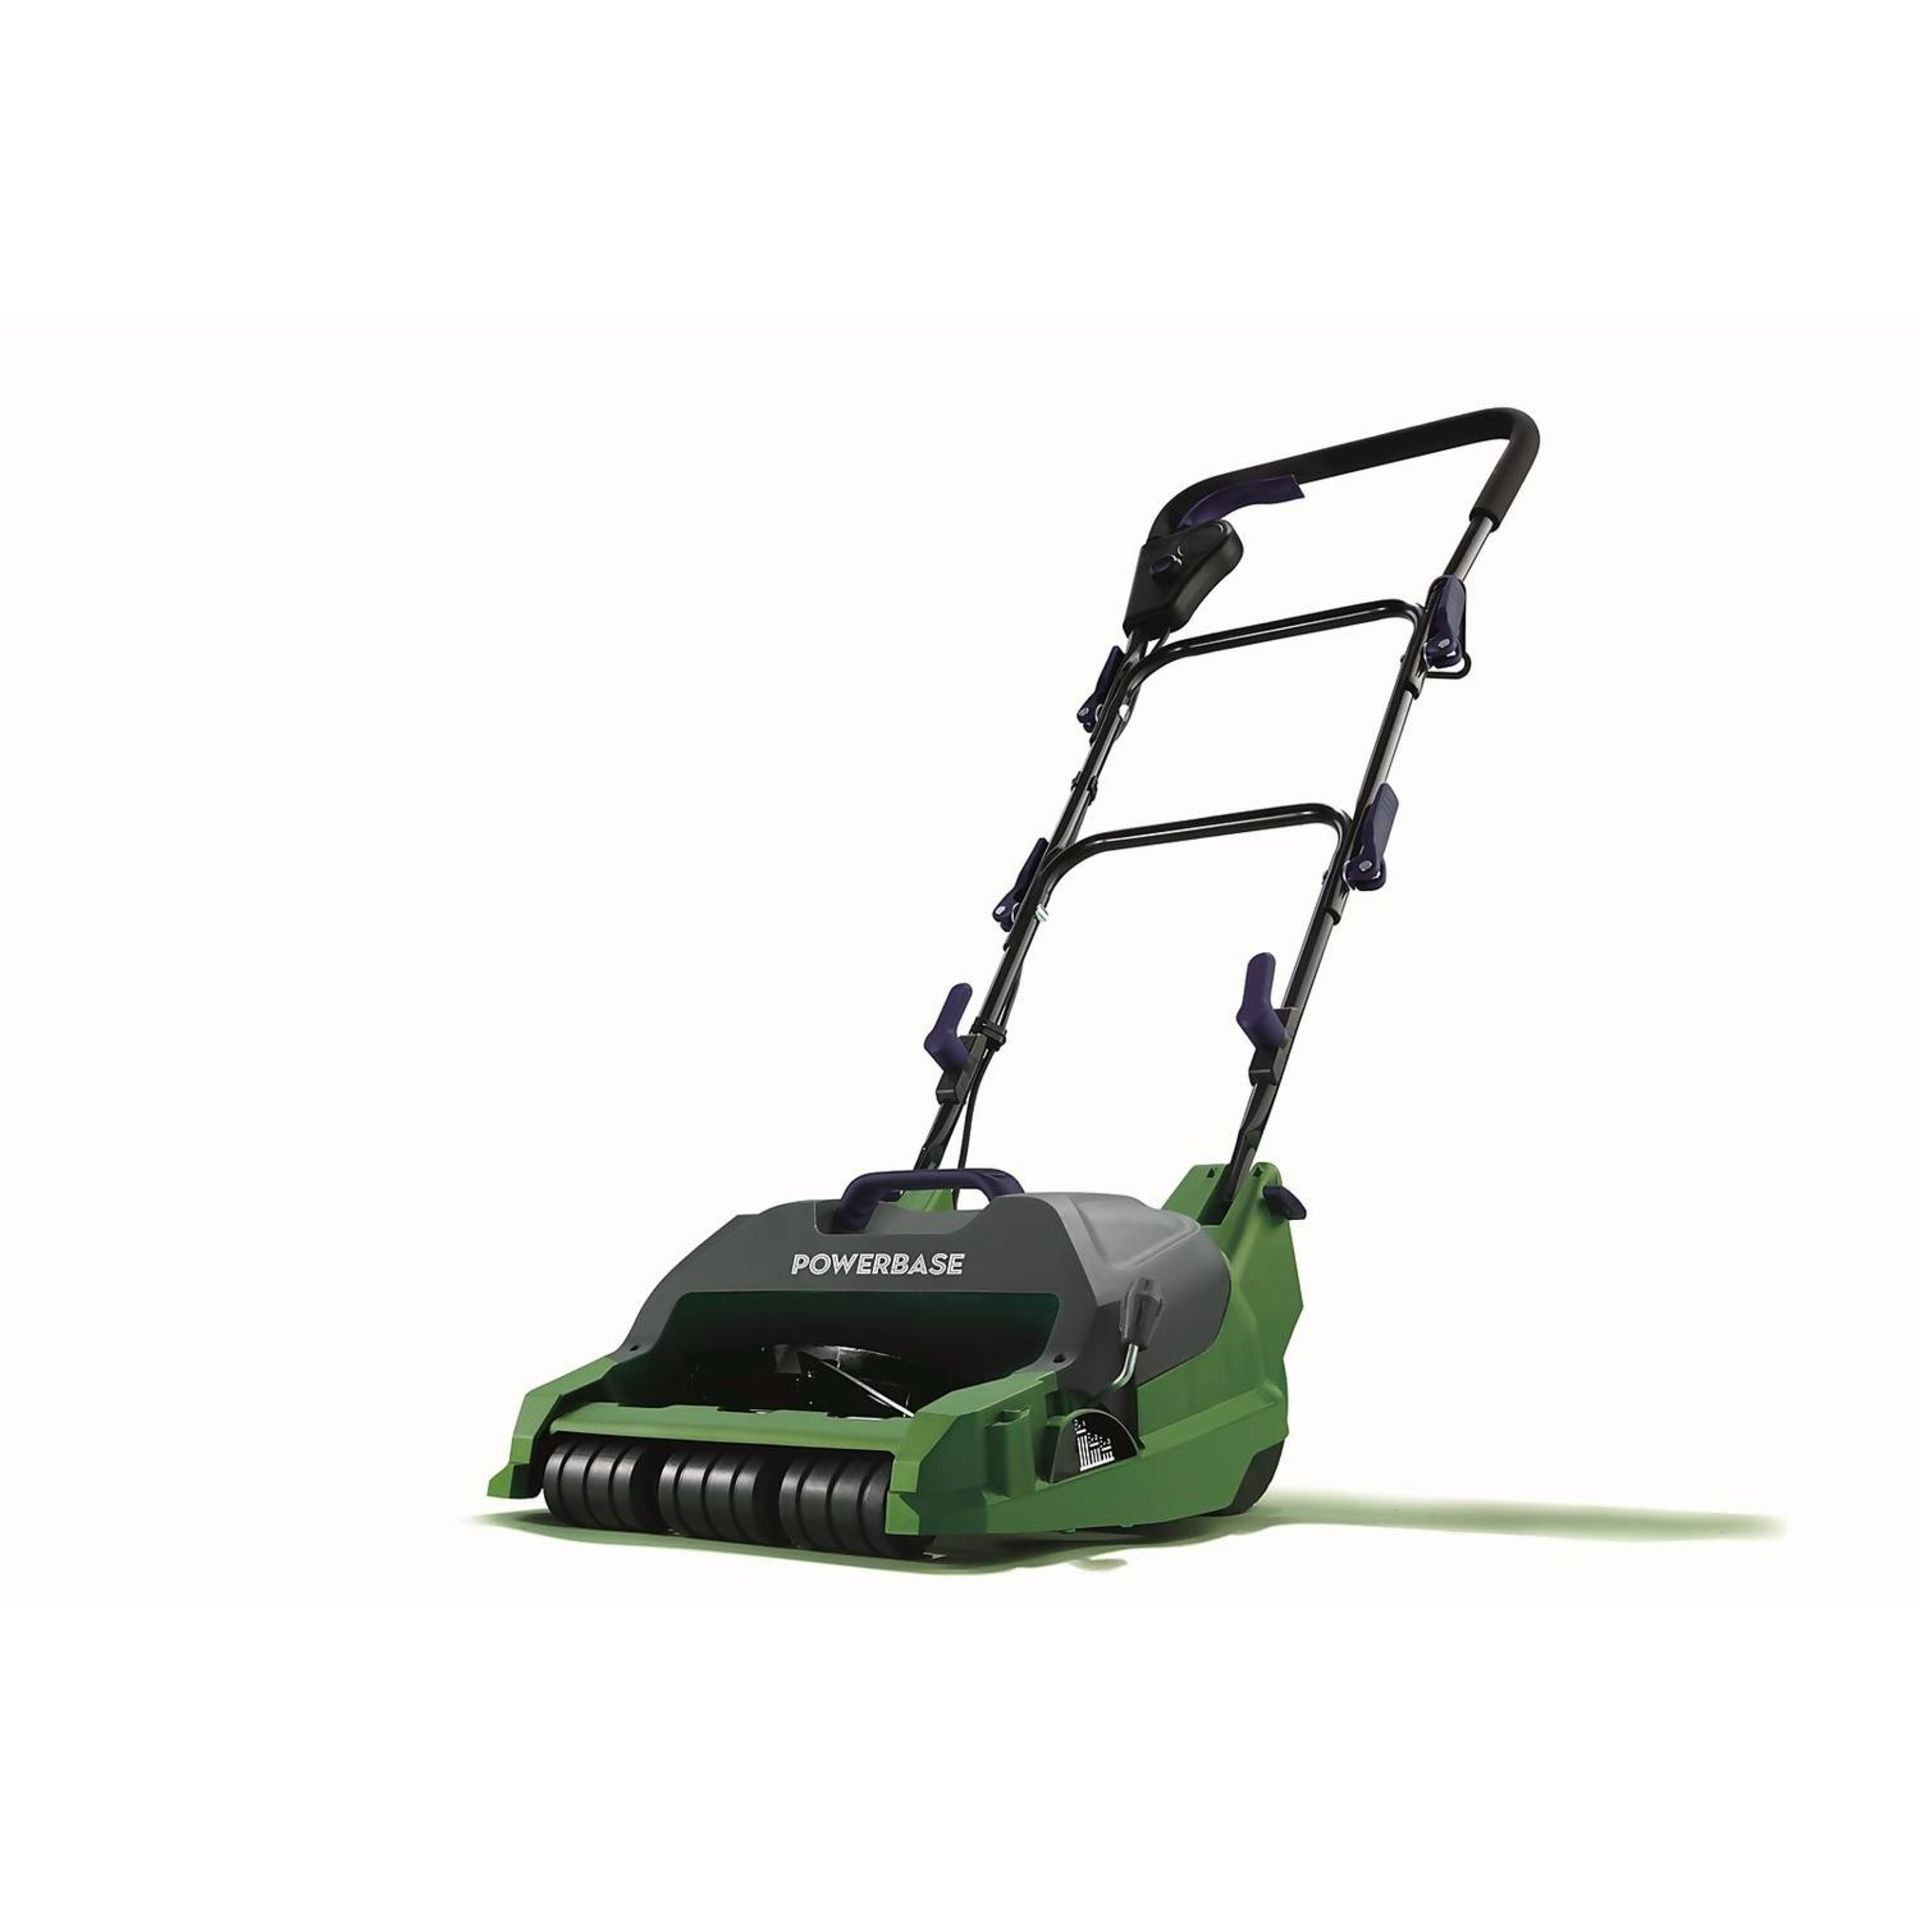 (P9) 2x Items. 1x Powerbase 32cm 400W Electric Cylinder Lawn Mower. RRP £89. 1x Qualcast 32cm 1200